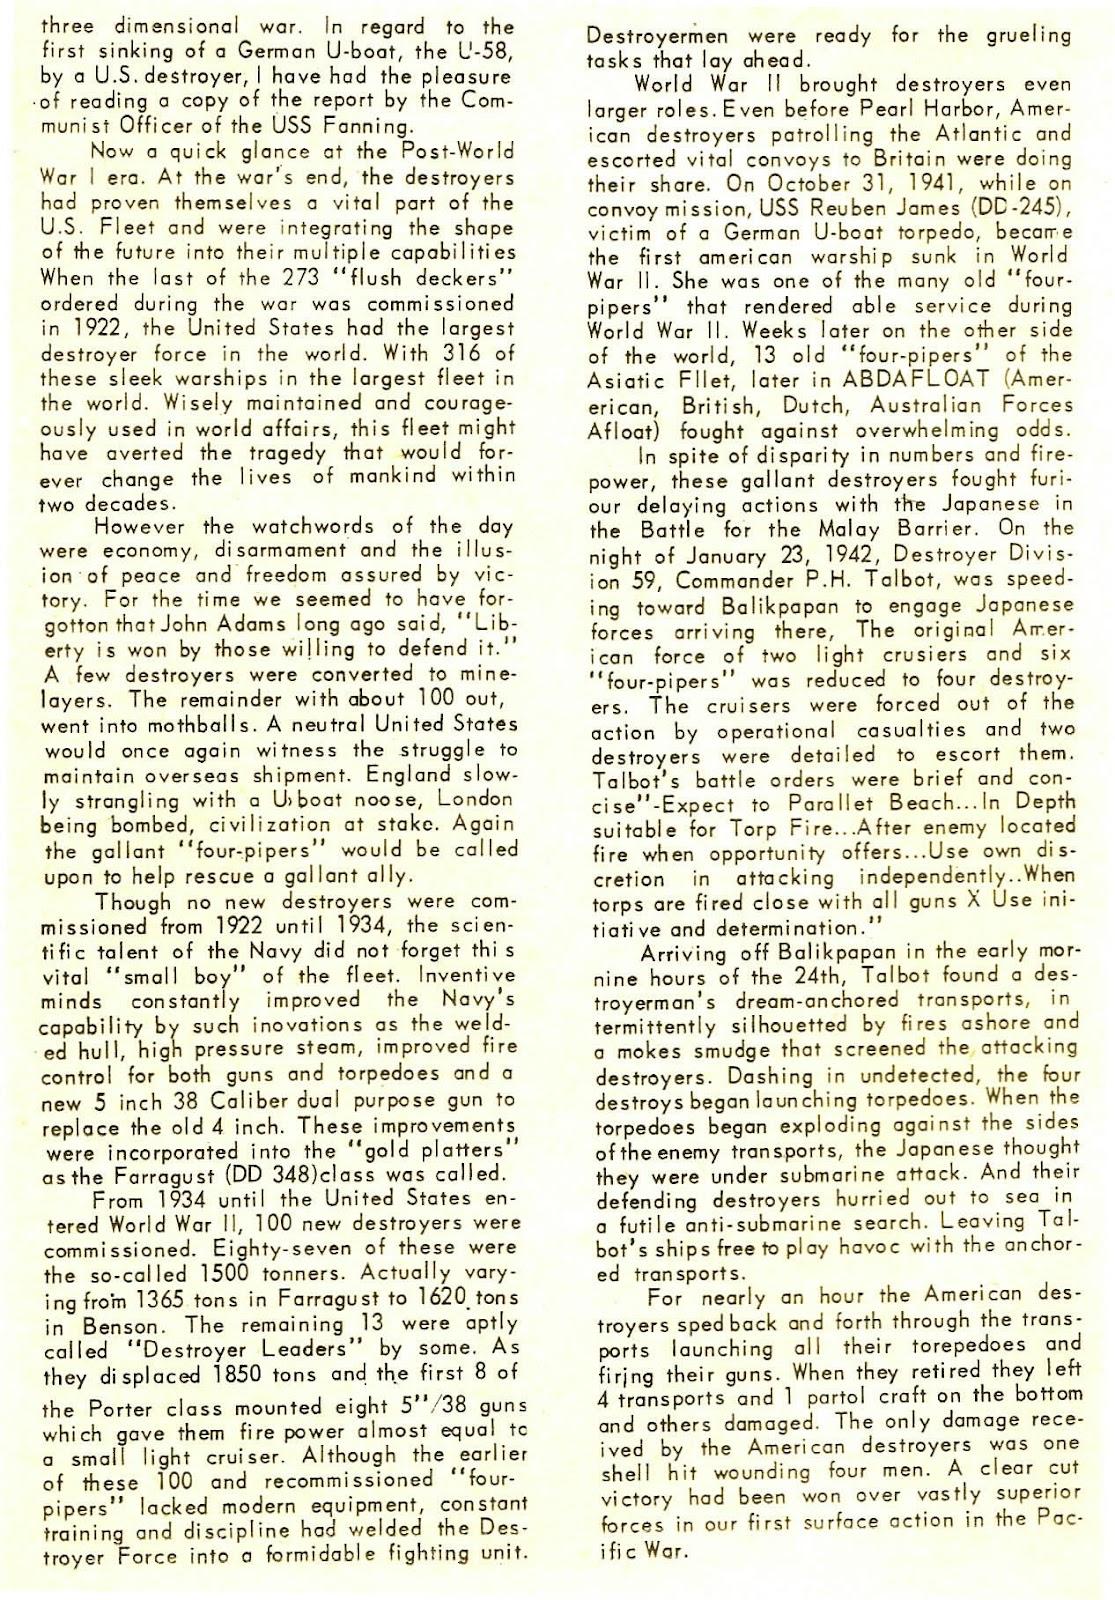 Read online Fightin' Navy comic -  Issue #119 - 24